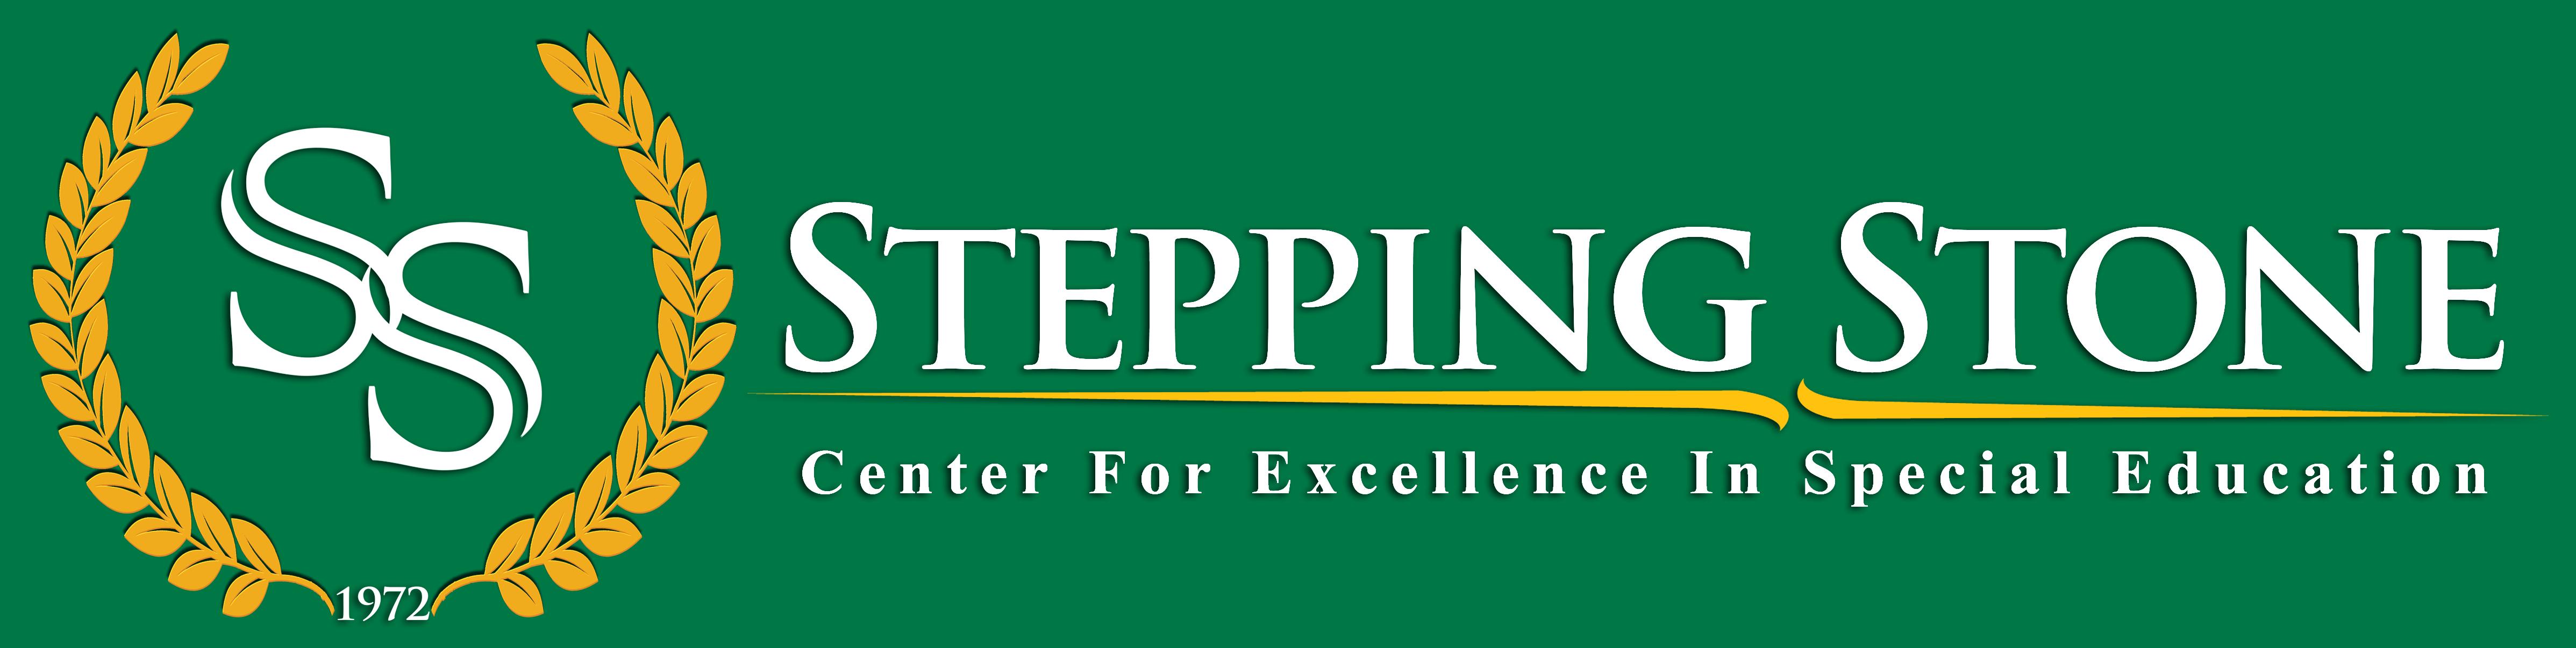 Stepping Stone Philippines horizontal logo